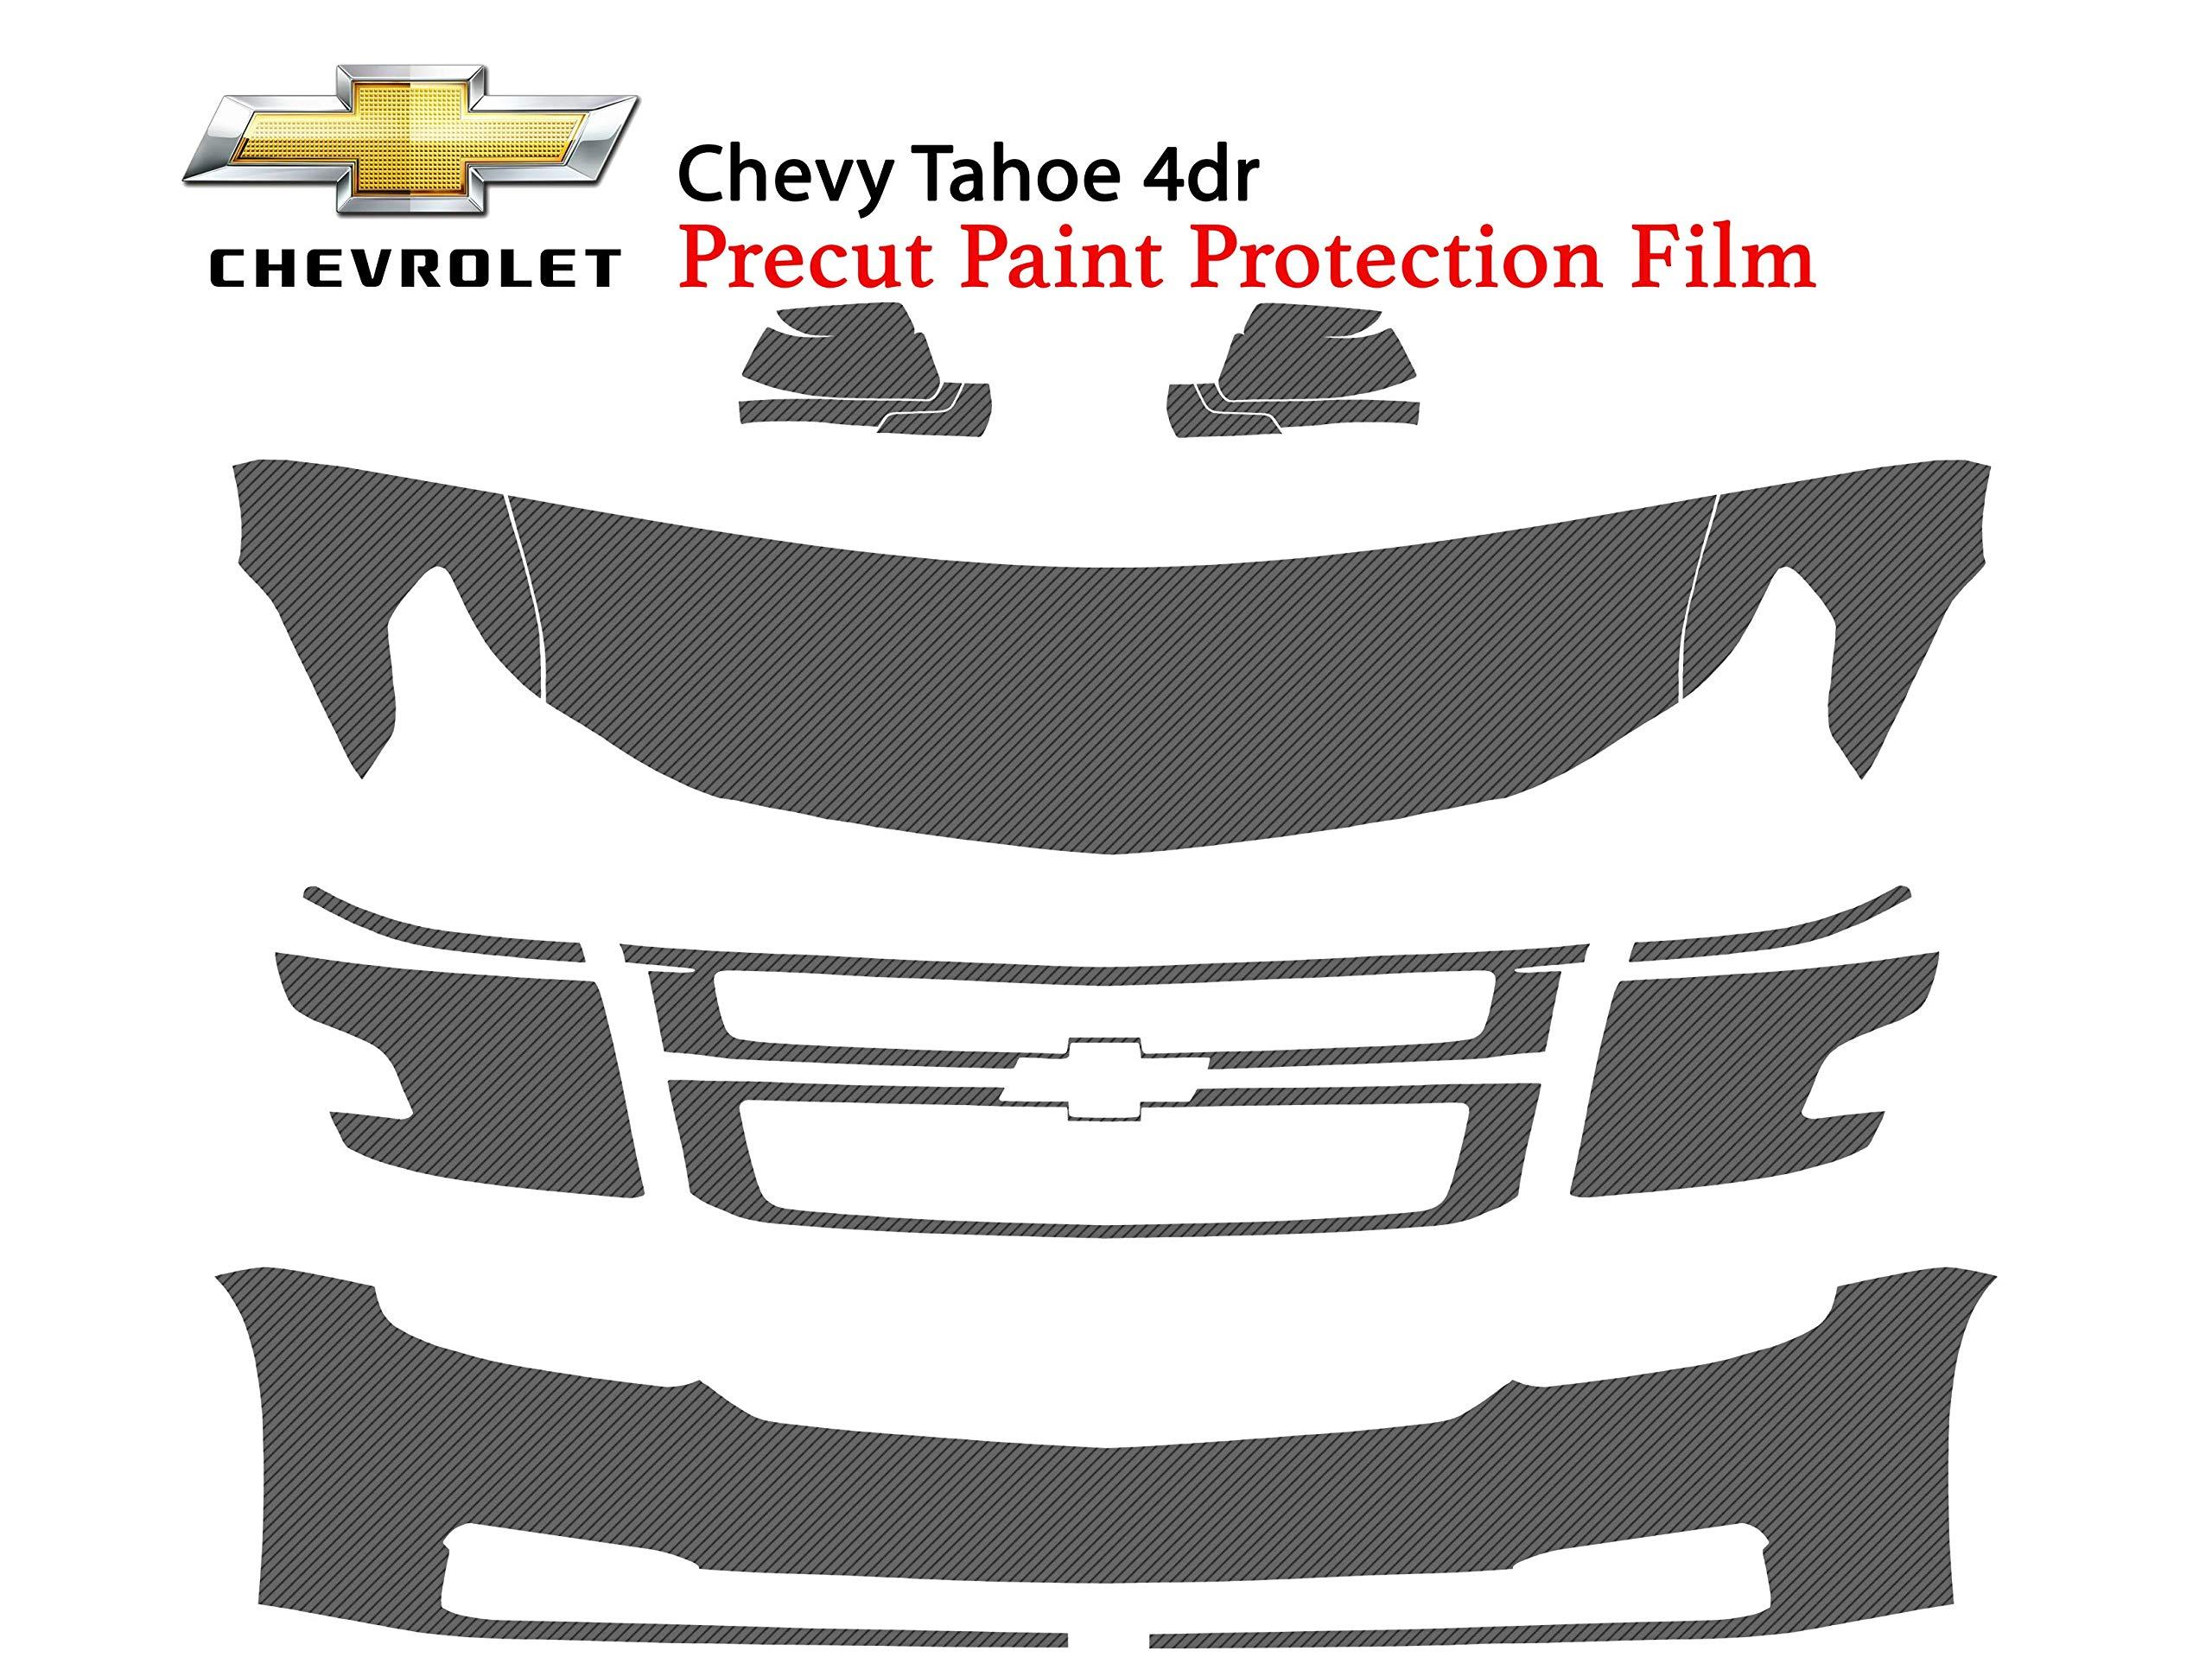 The Online Liquidator Precut Clear Bra Paint Protection Film Kit fits Chevrolet Tahoe 4dr 2015-2018 - Premium Full Front Vinyl Wrap Surface Safeguard Cover